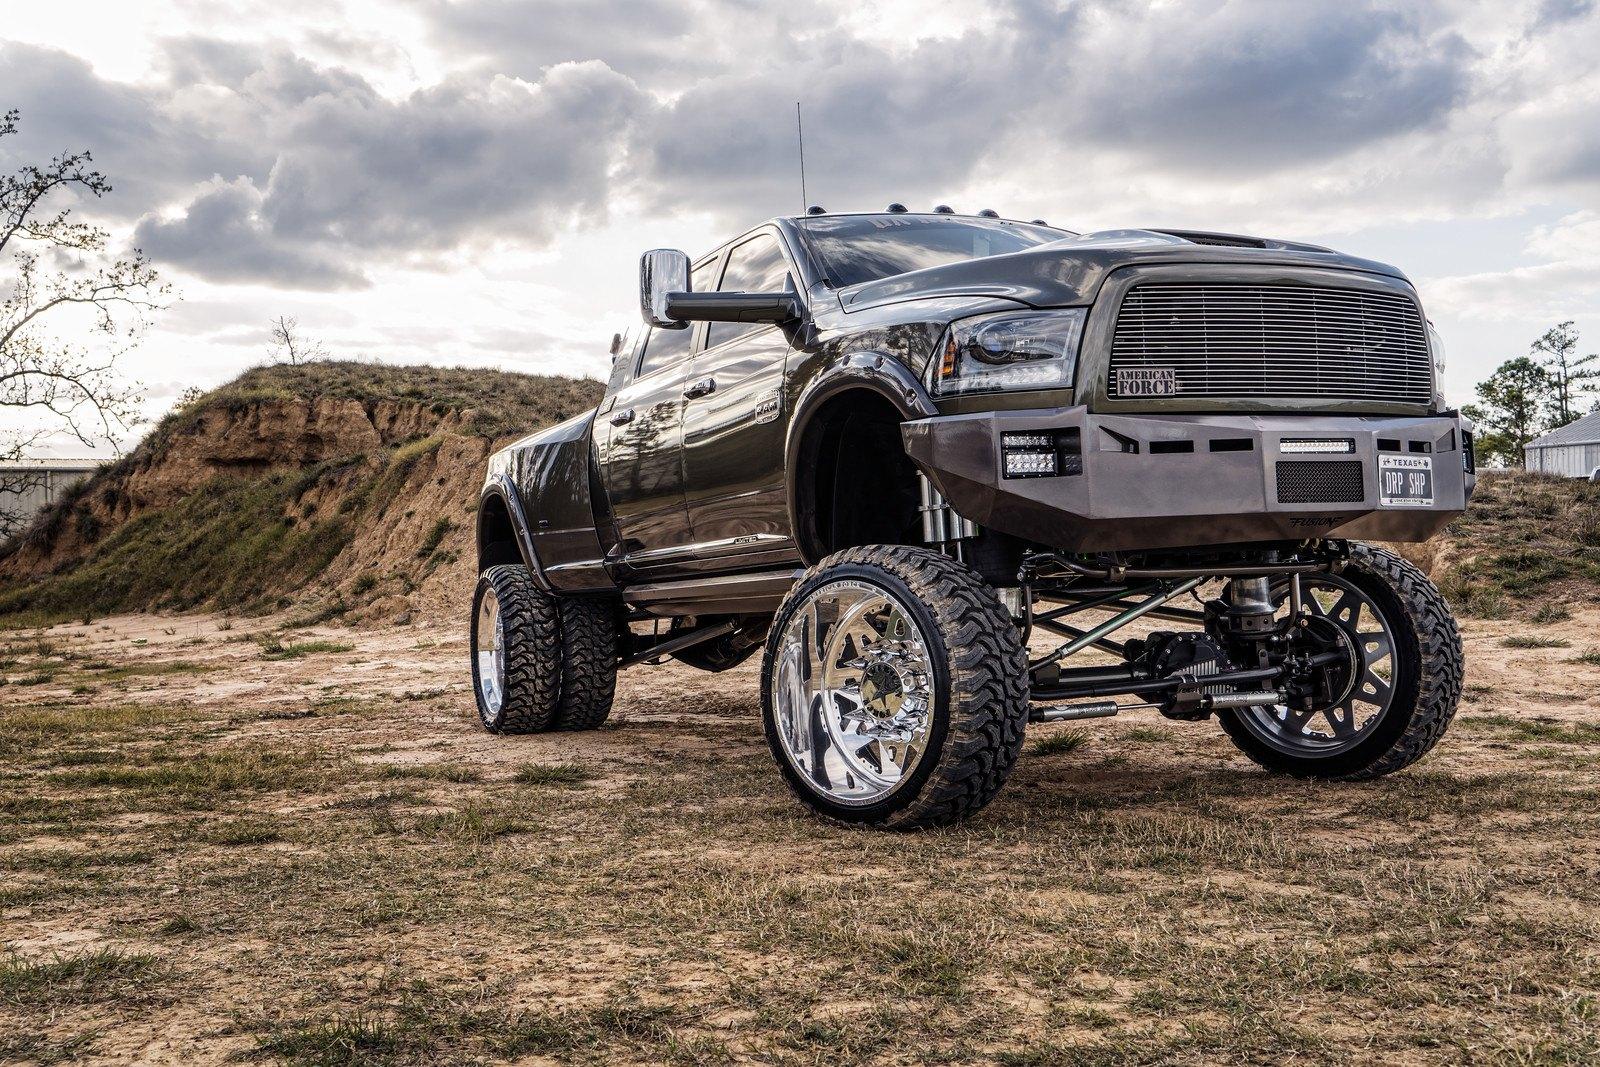 Dodge Ram Outback 3500 Beast On American Force Wheels Carid Com Gallery